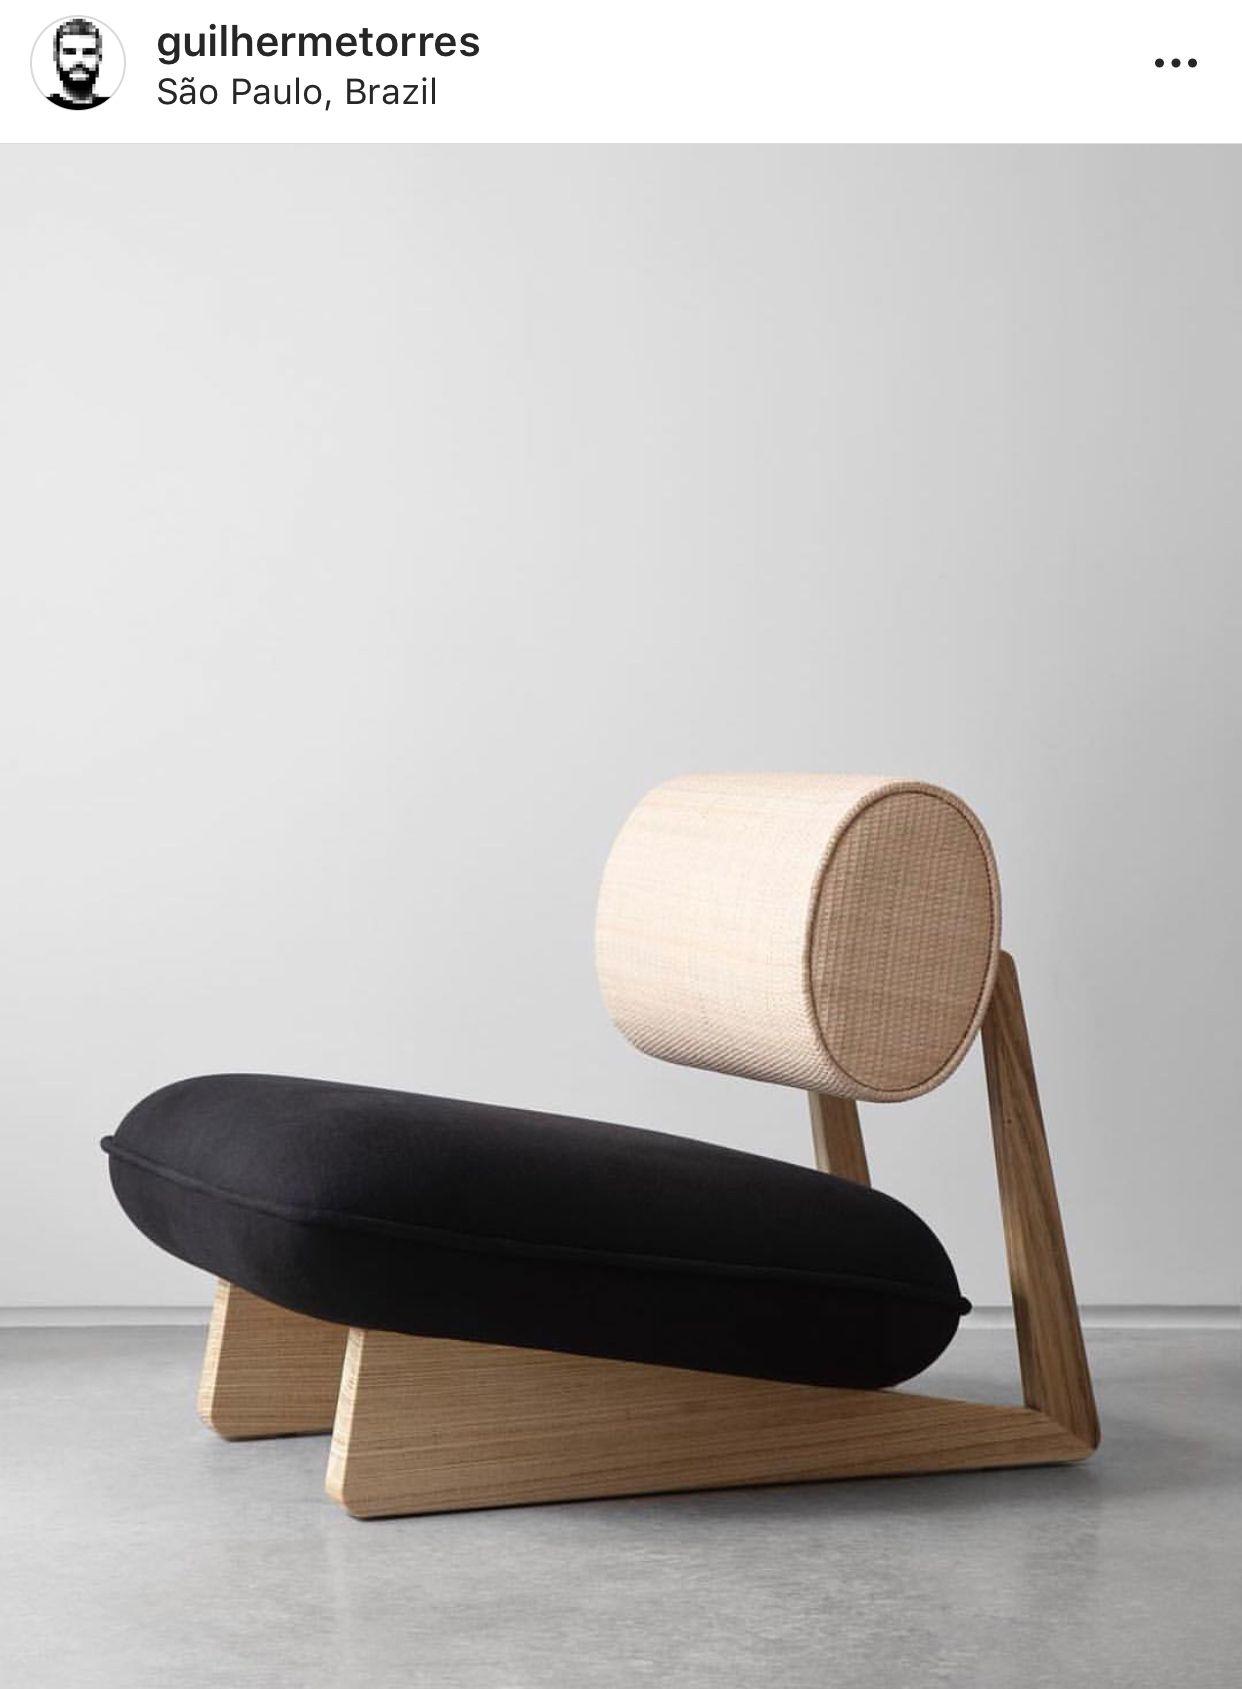 Retro futuristic version furniture design